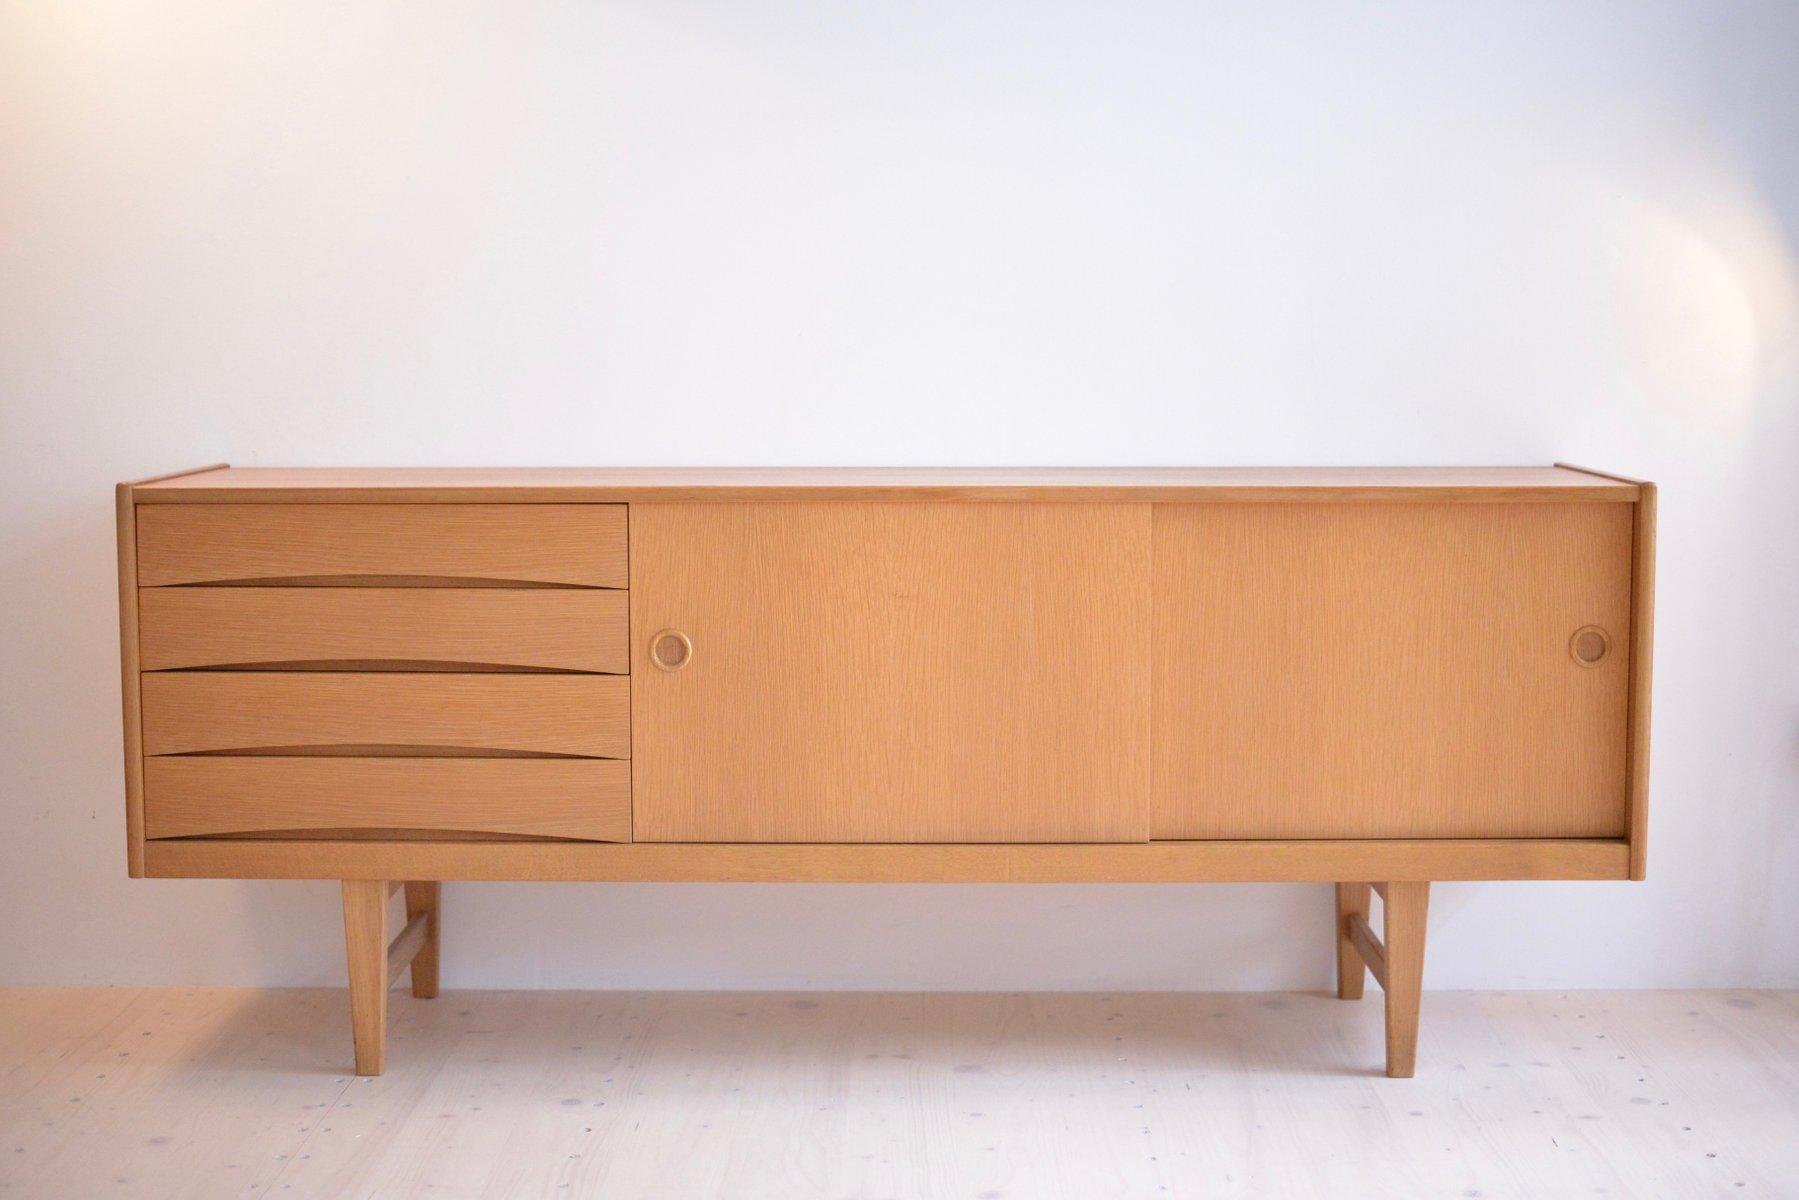 Ikea gartenmobel rot - Danisches bettenlager balkonmobel ...